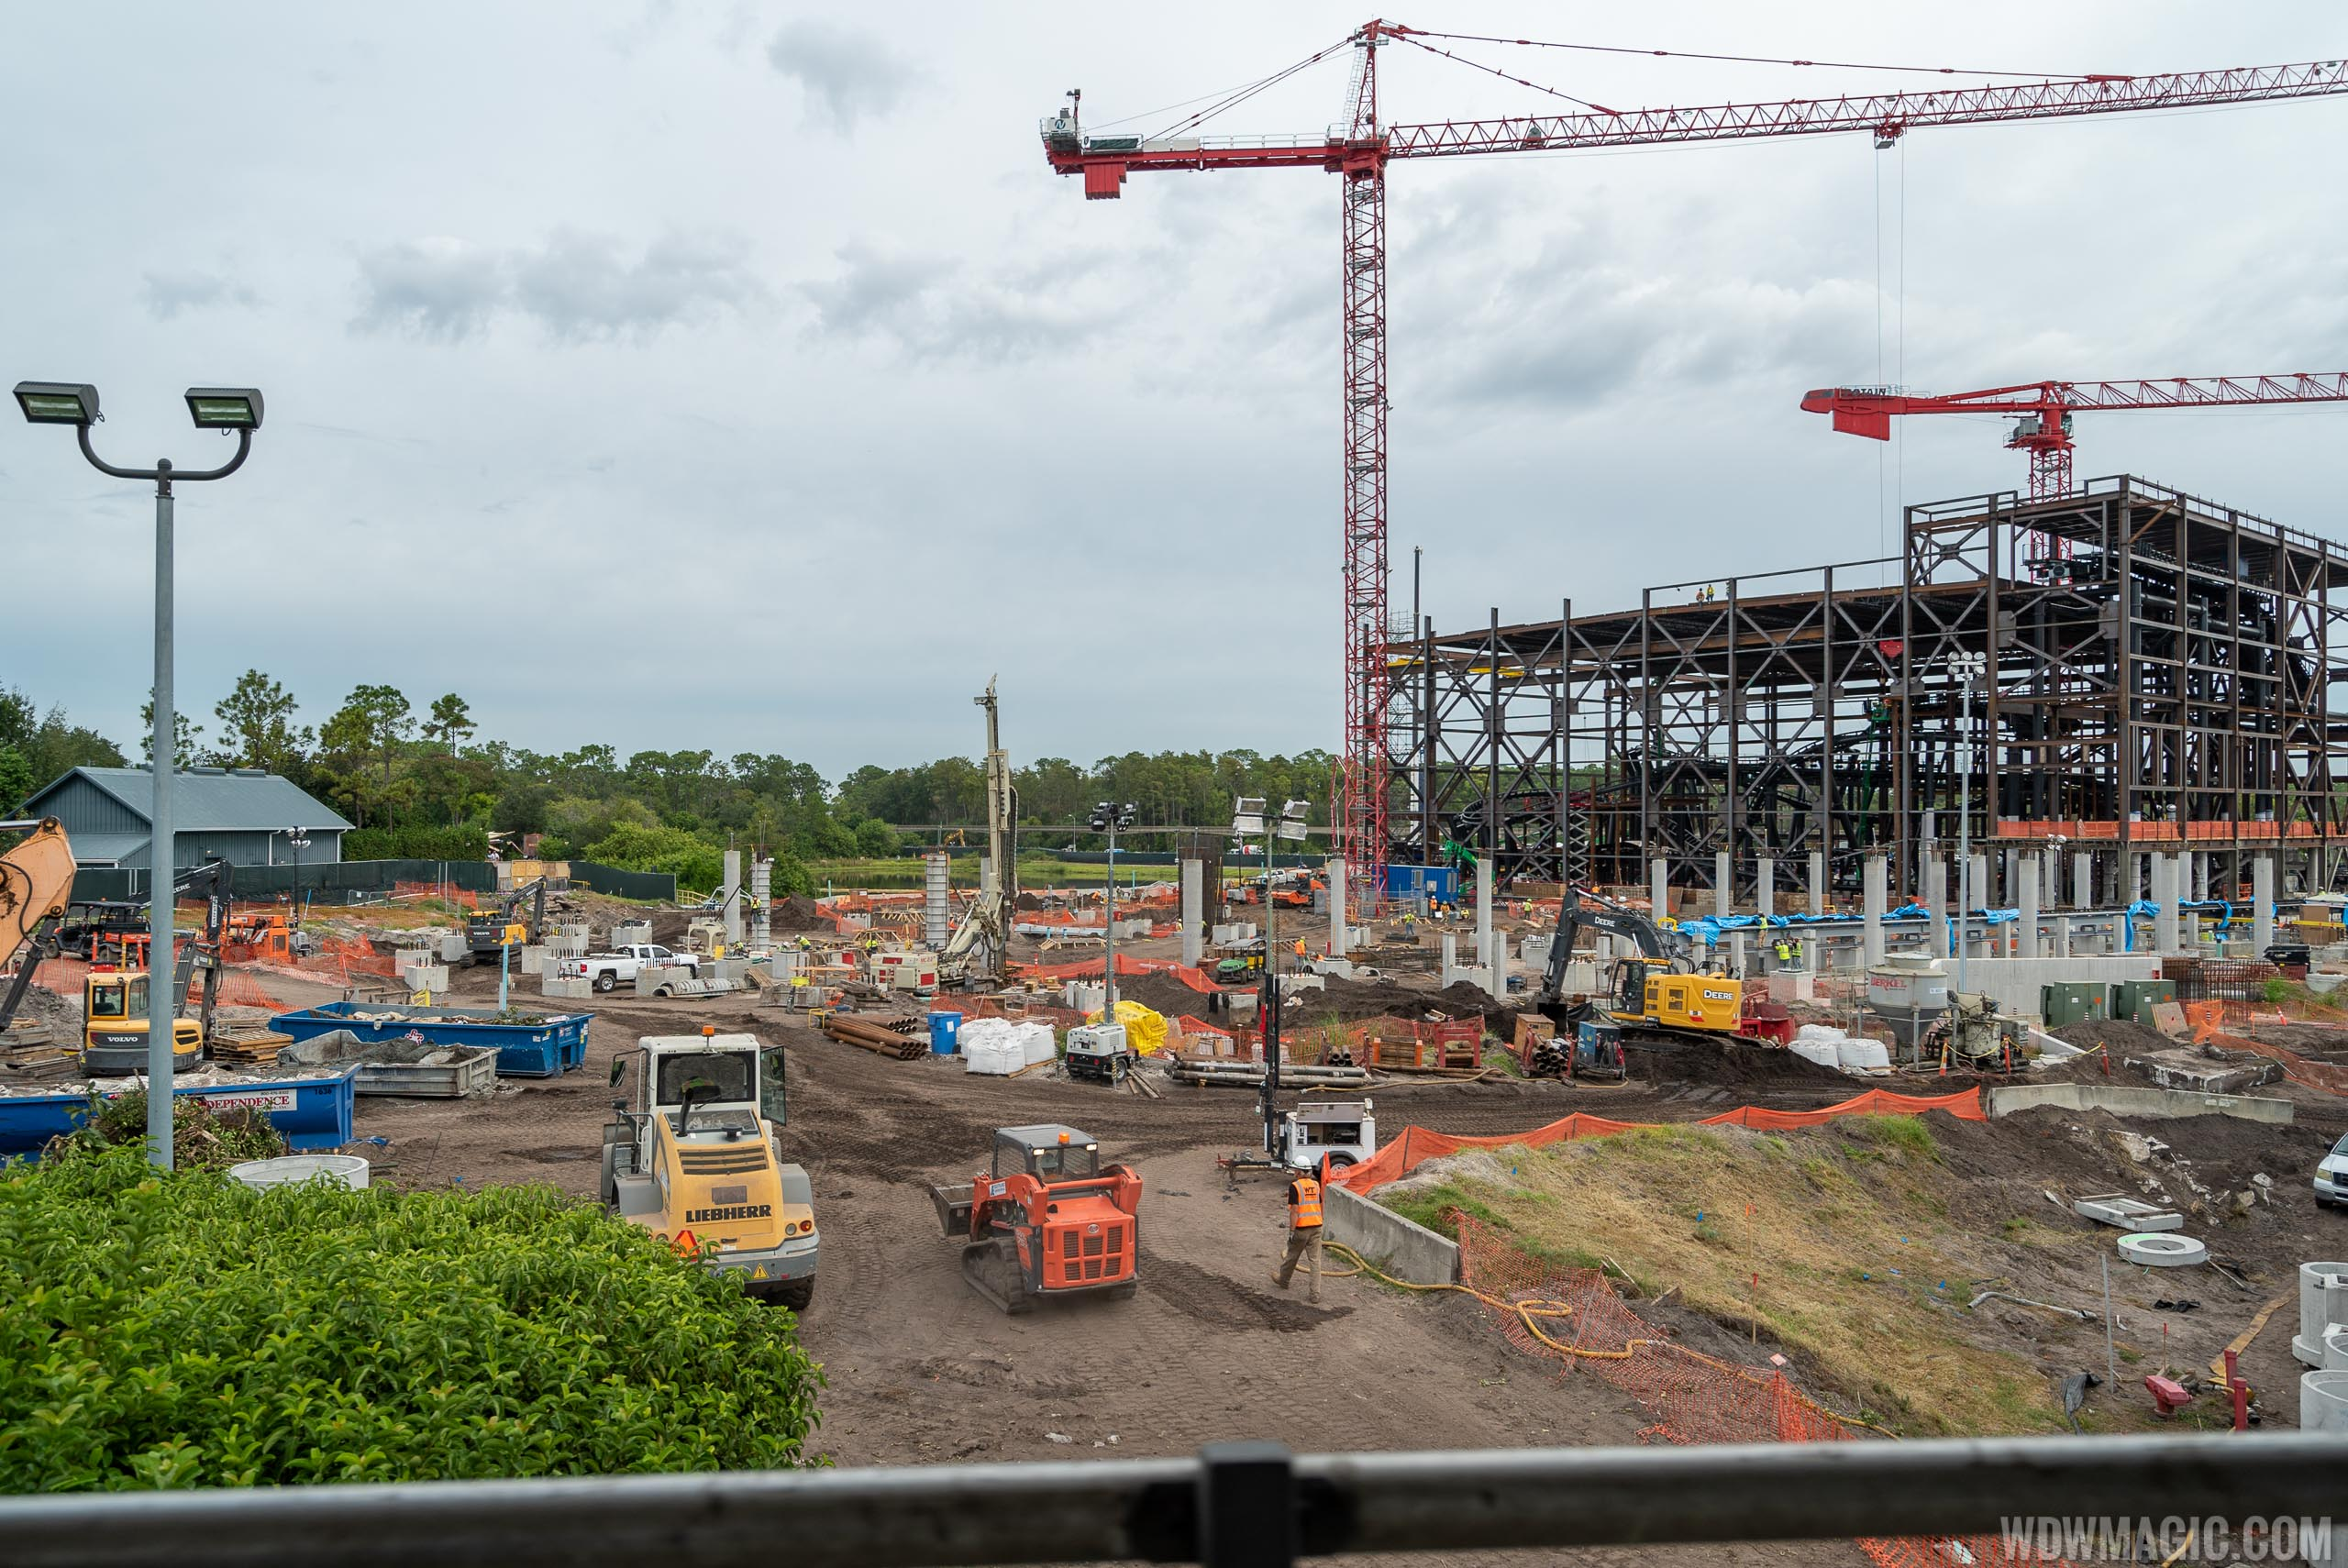 TRON Lightcycle Run construction site - October 2019